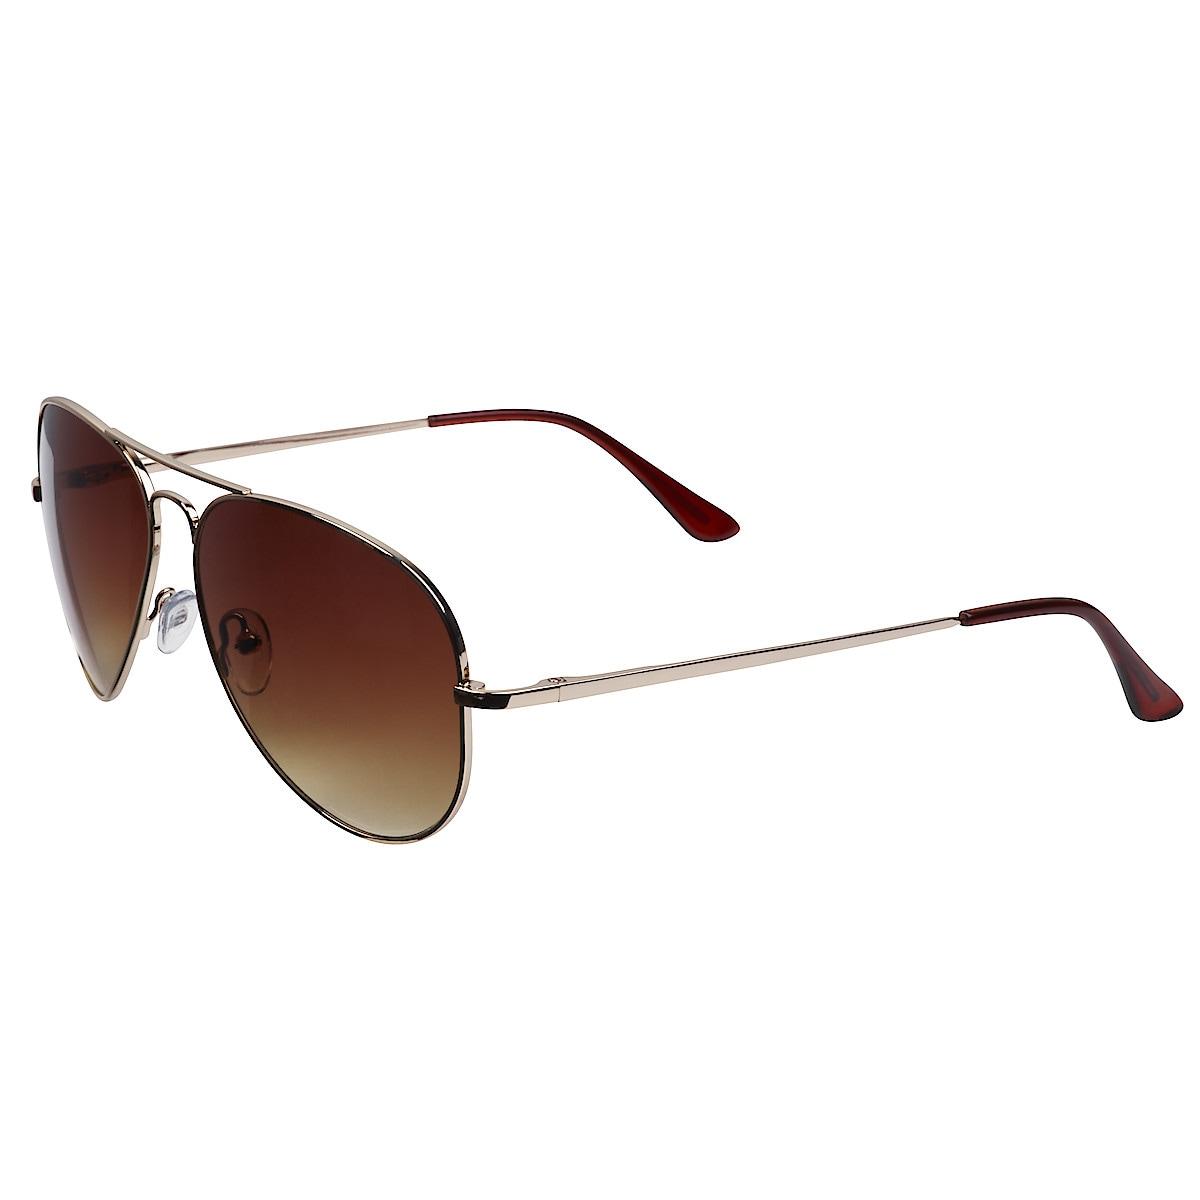 Solglasögon metall